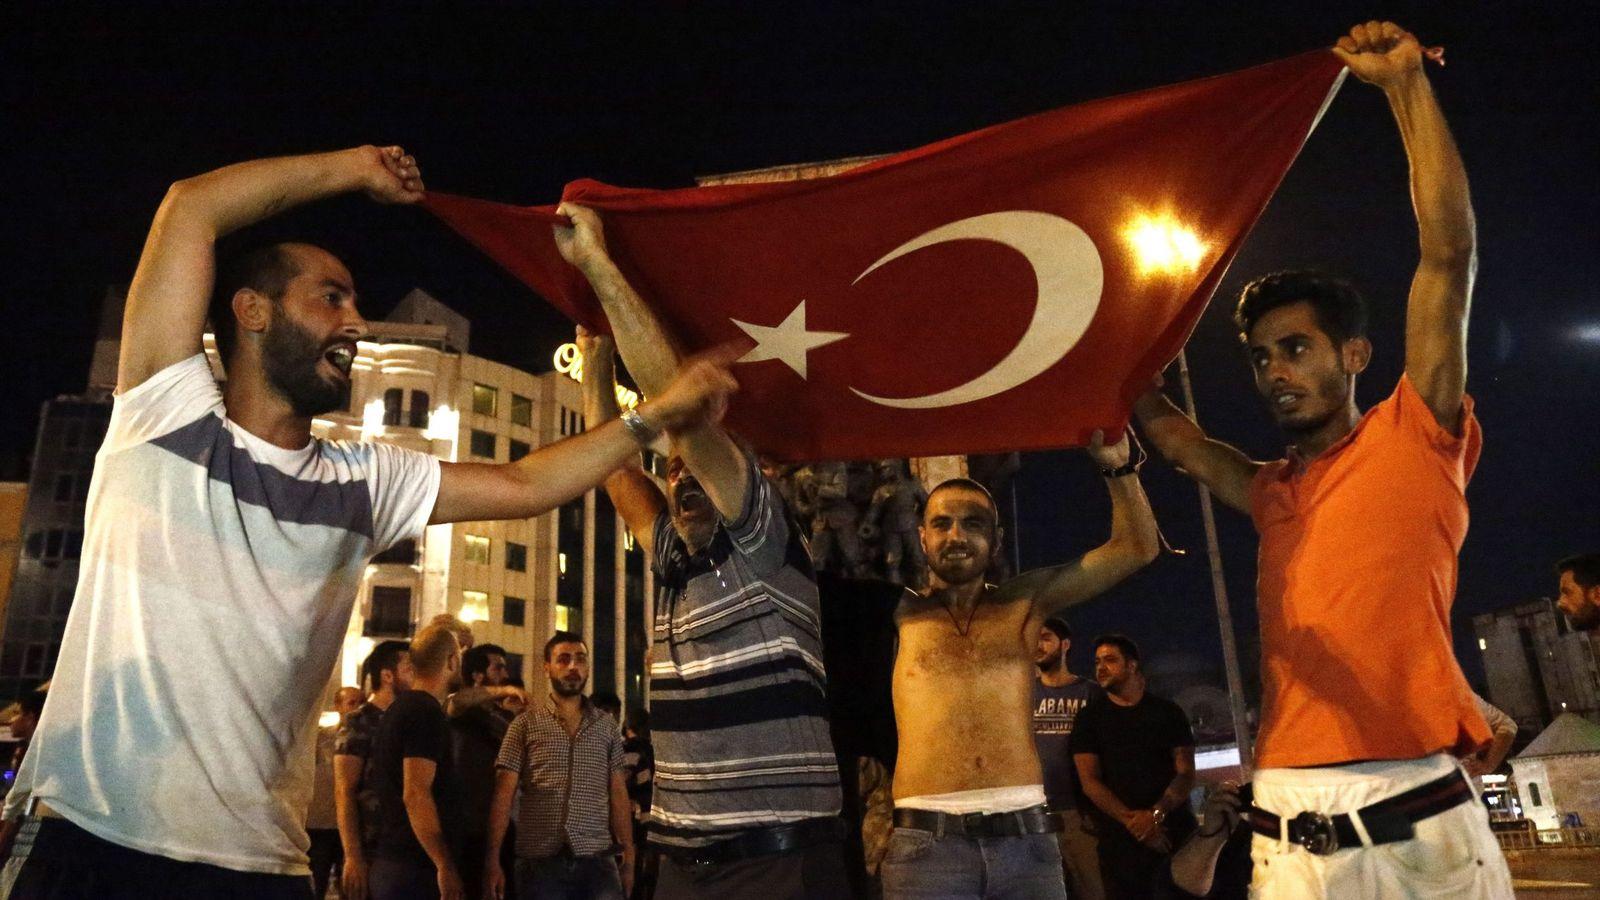 Foto: Simpatizantes de Erdogan en la Plaza Taksim de Estambul. (EFE)